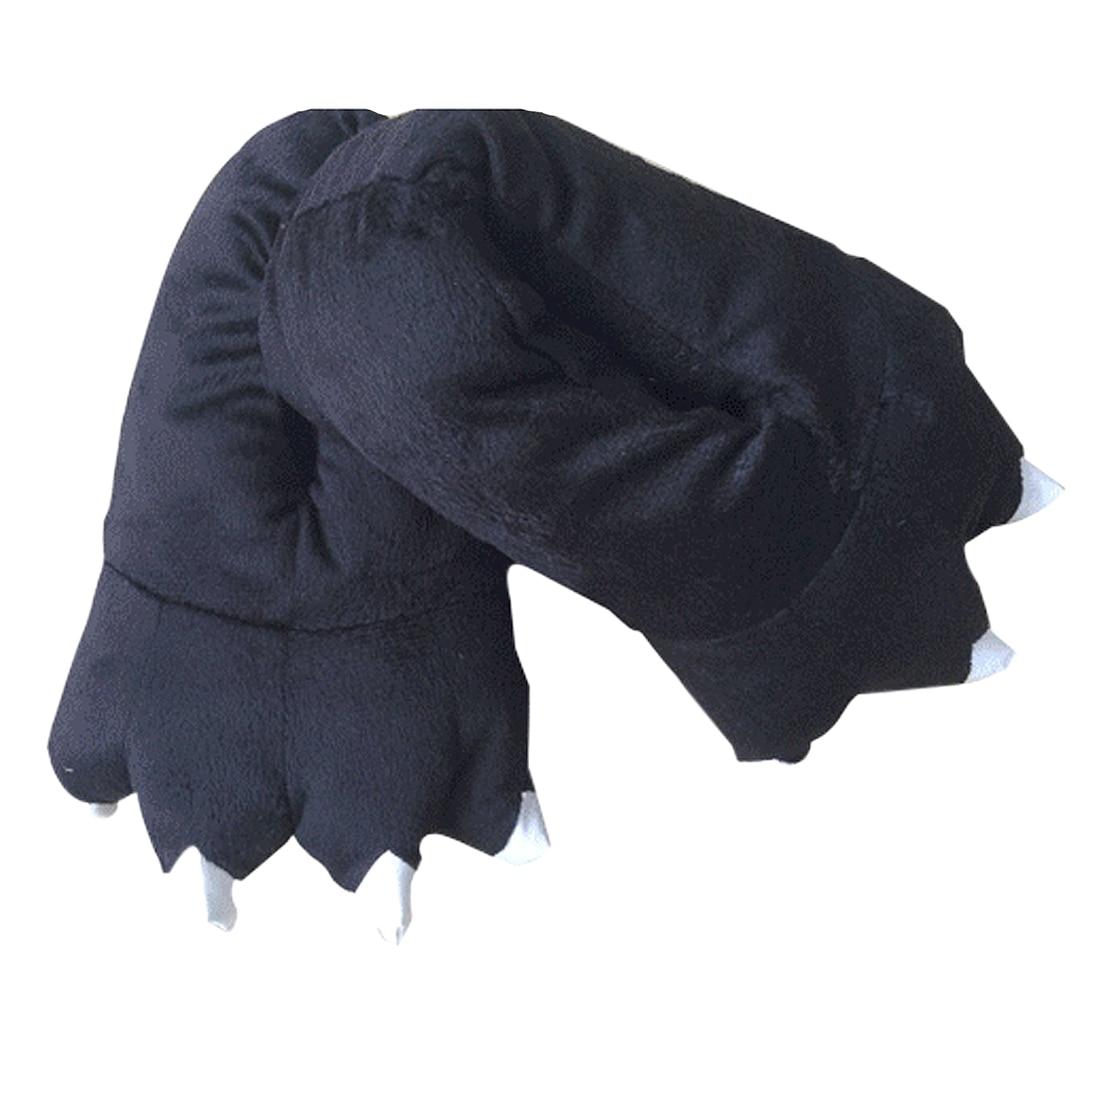 ABDB black Slippers winter animals fancy plush claw slippers abdb black slippers winter animals fancy plush claw slippers